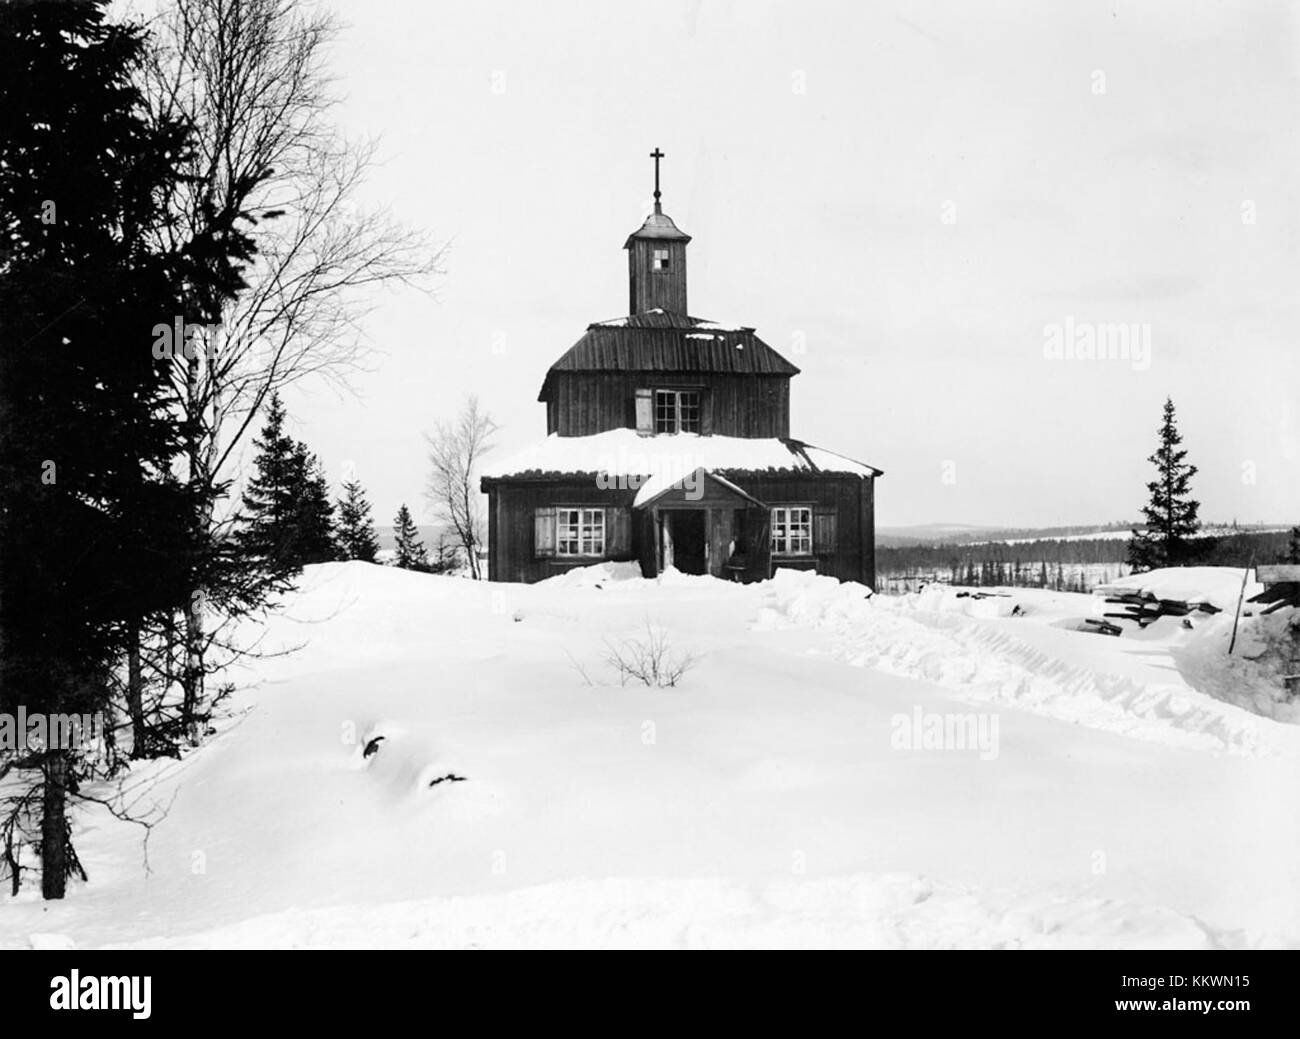 Garpenberg Miners' Chapel, Dalarna, Sweden - Stock Image